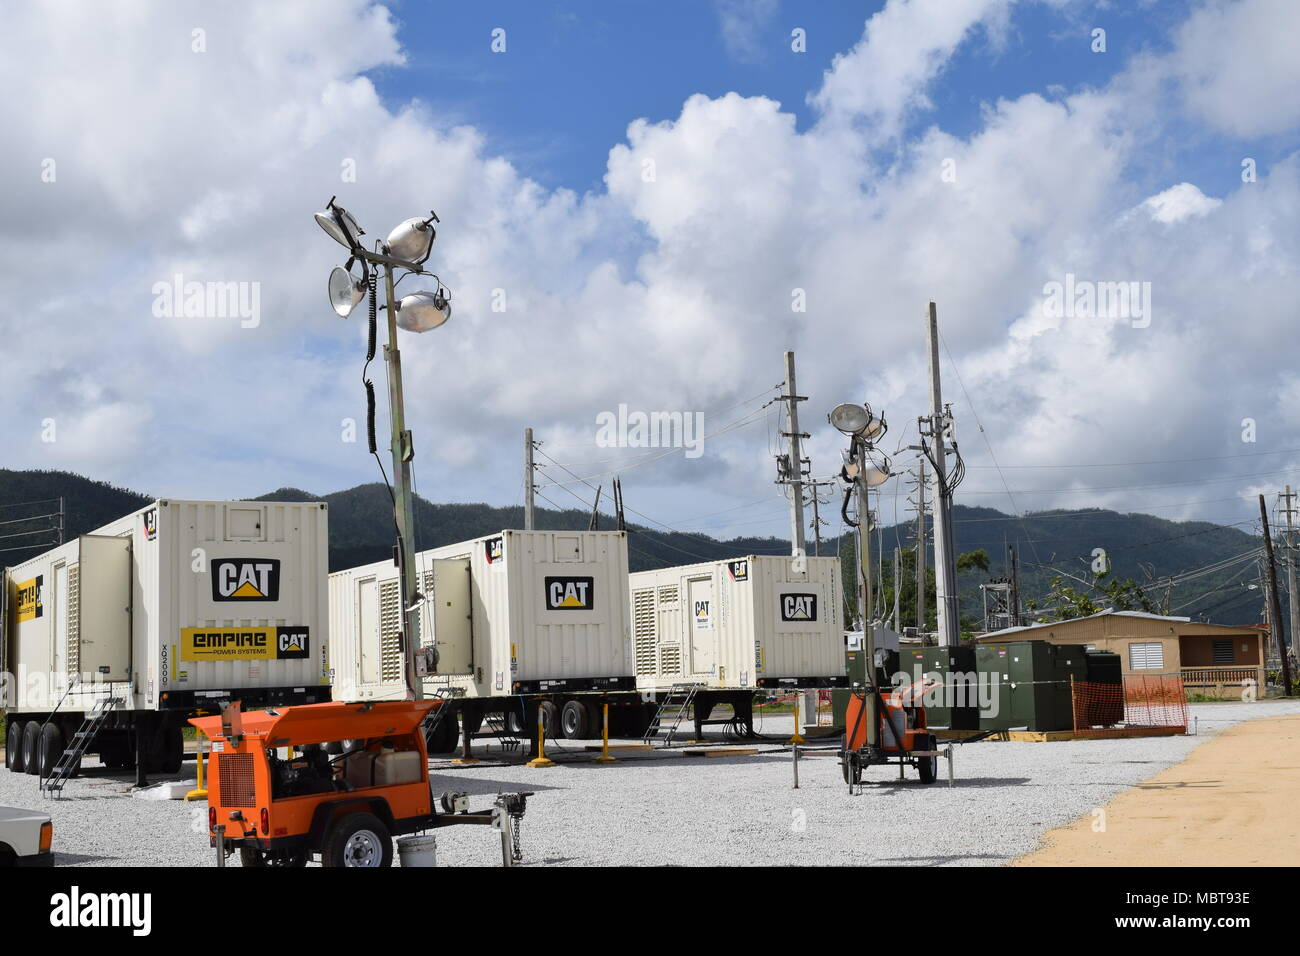 Temporary Power Supply Stock Photos & Temporary Power Supply